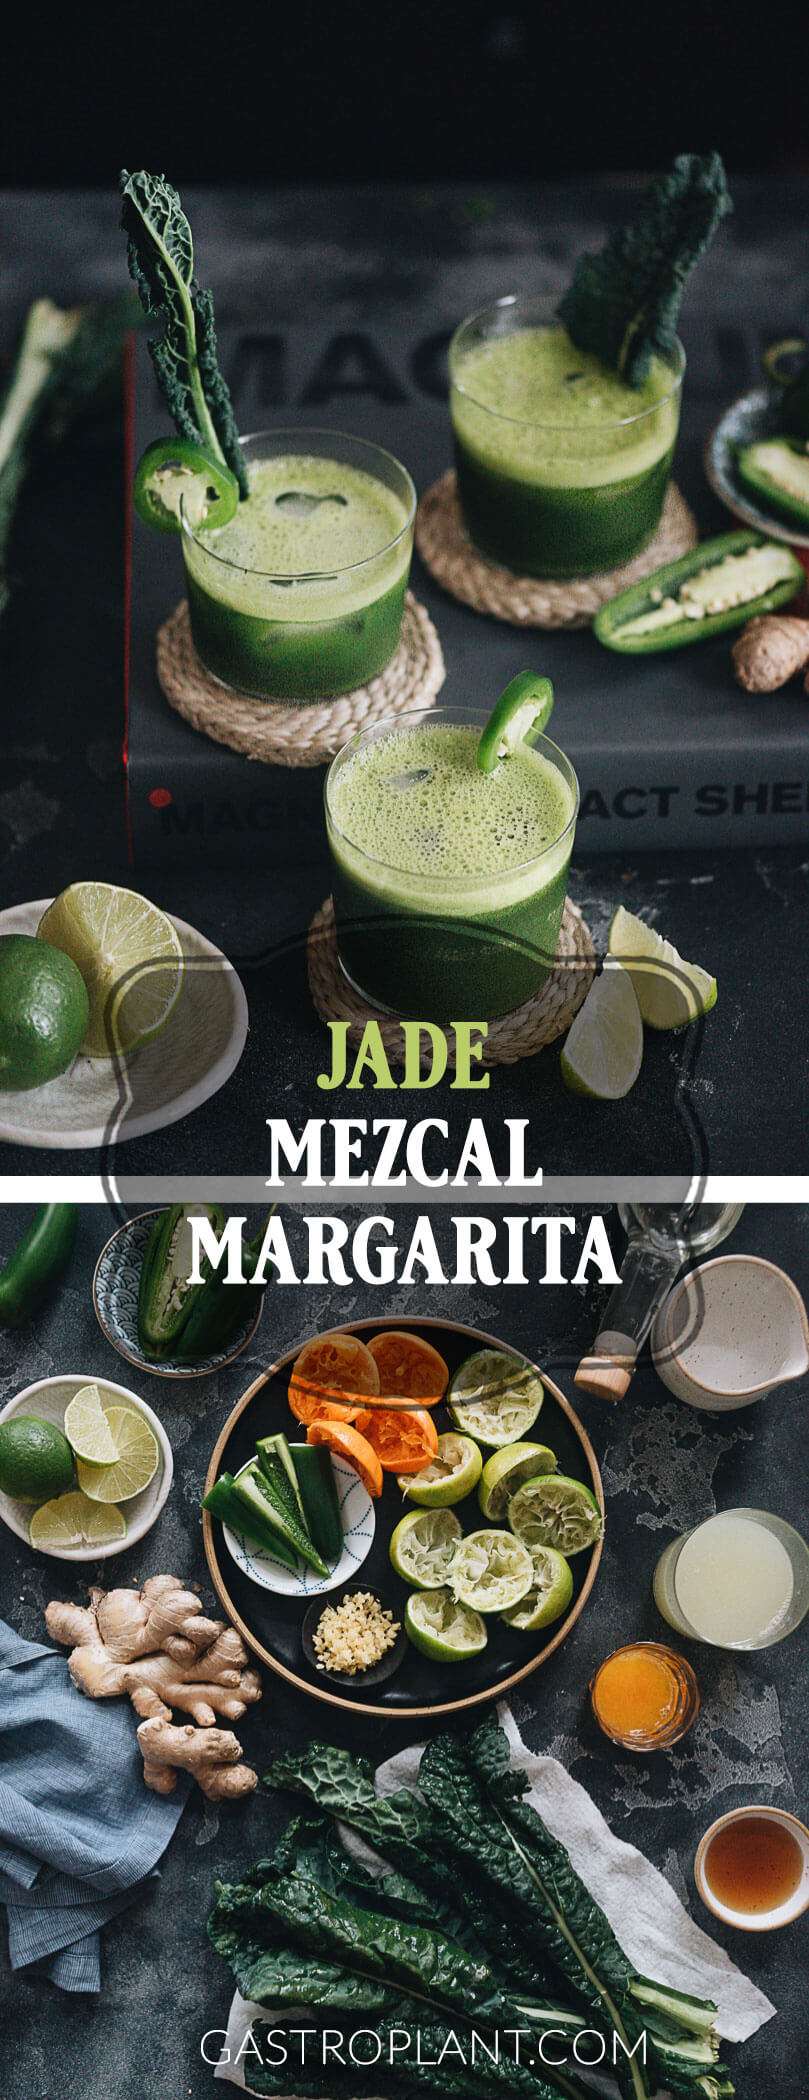 Refreshing and complex jade mezcal margarita